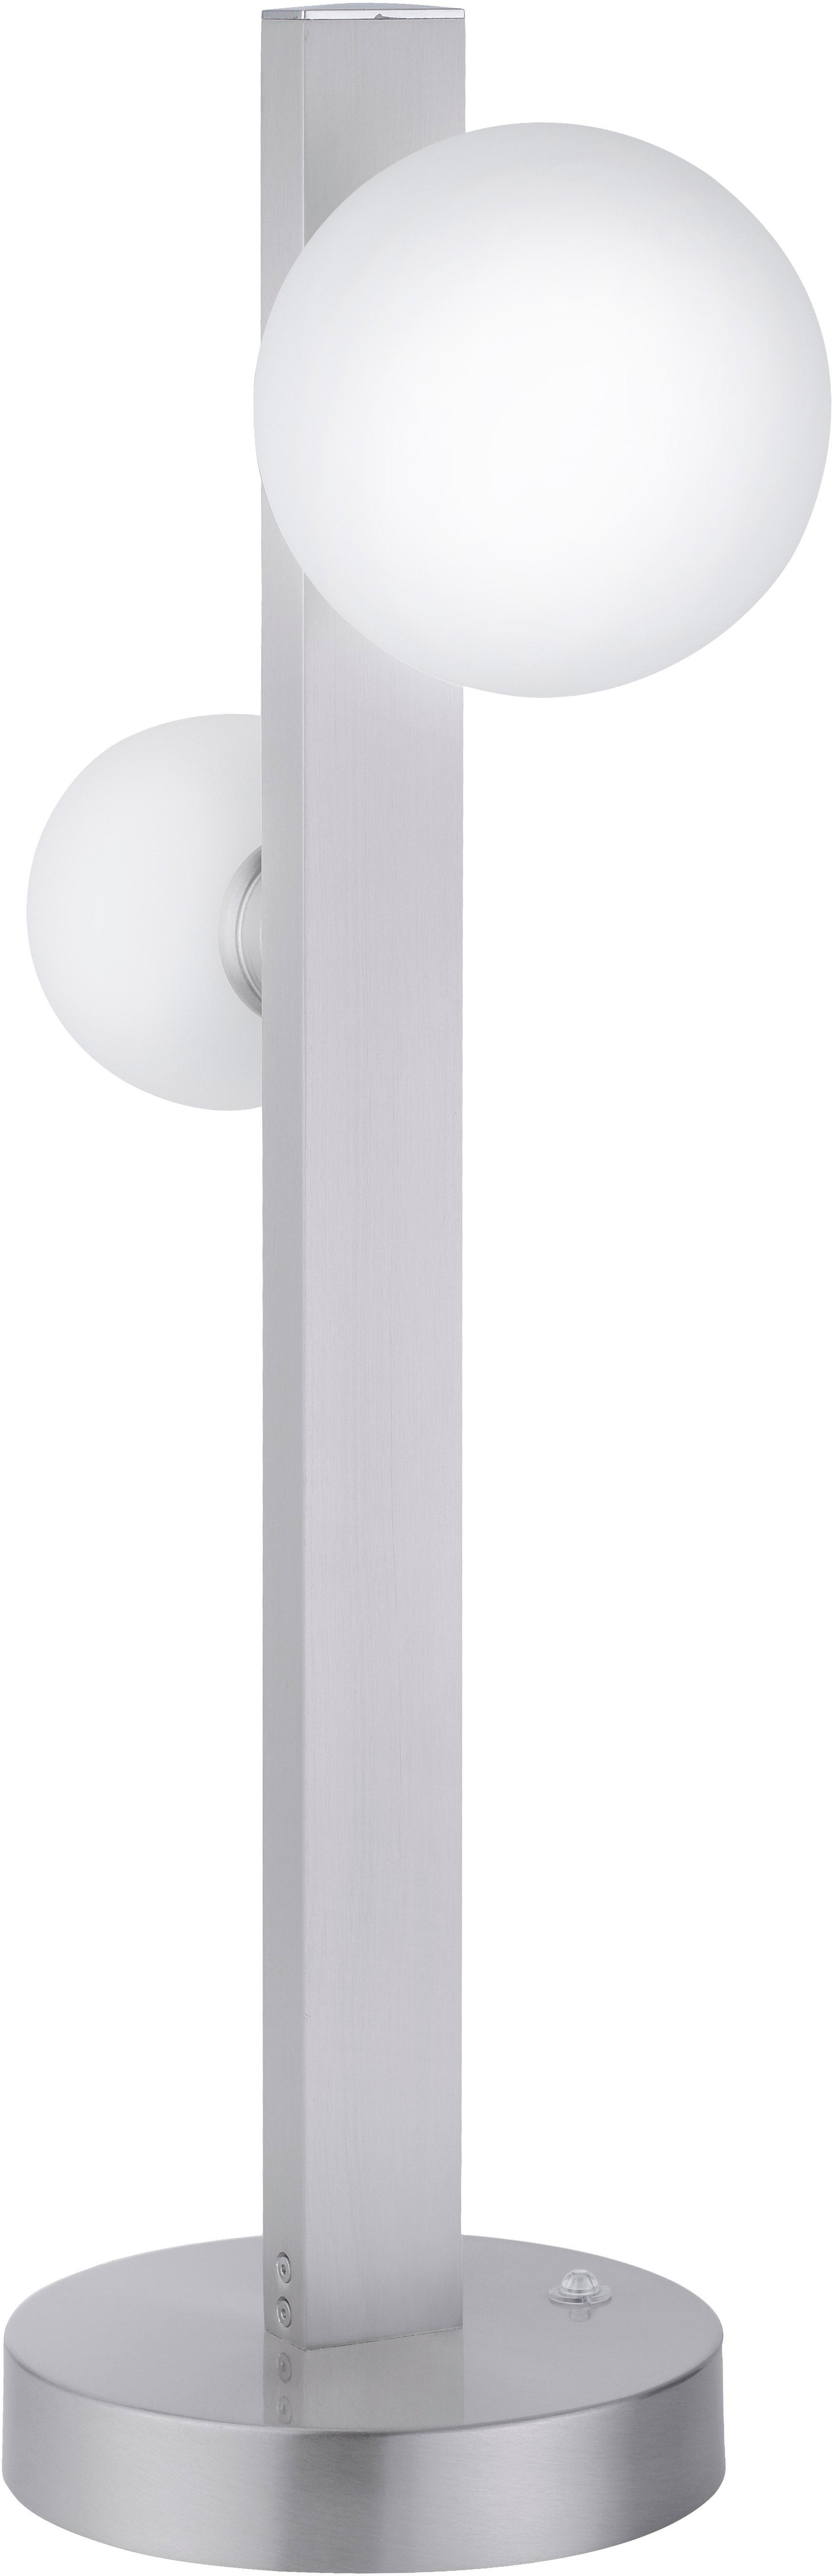 TRIO Leuchten,LED Tischleuchte DICAPO